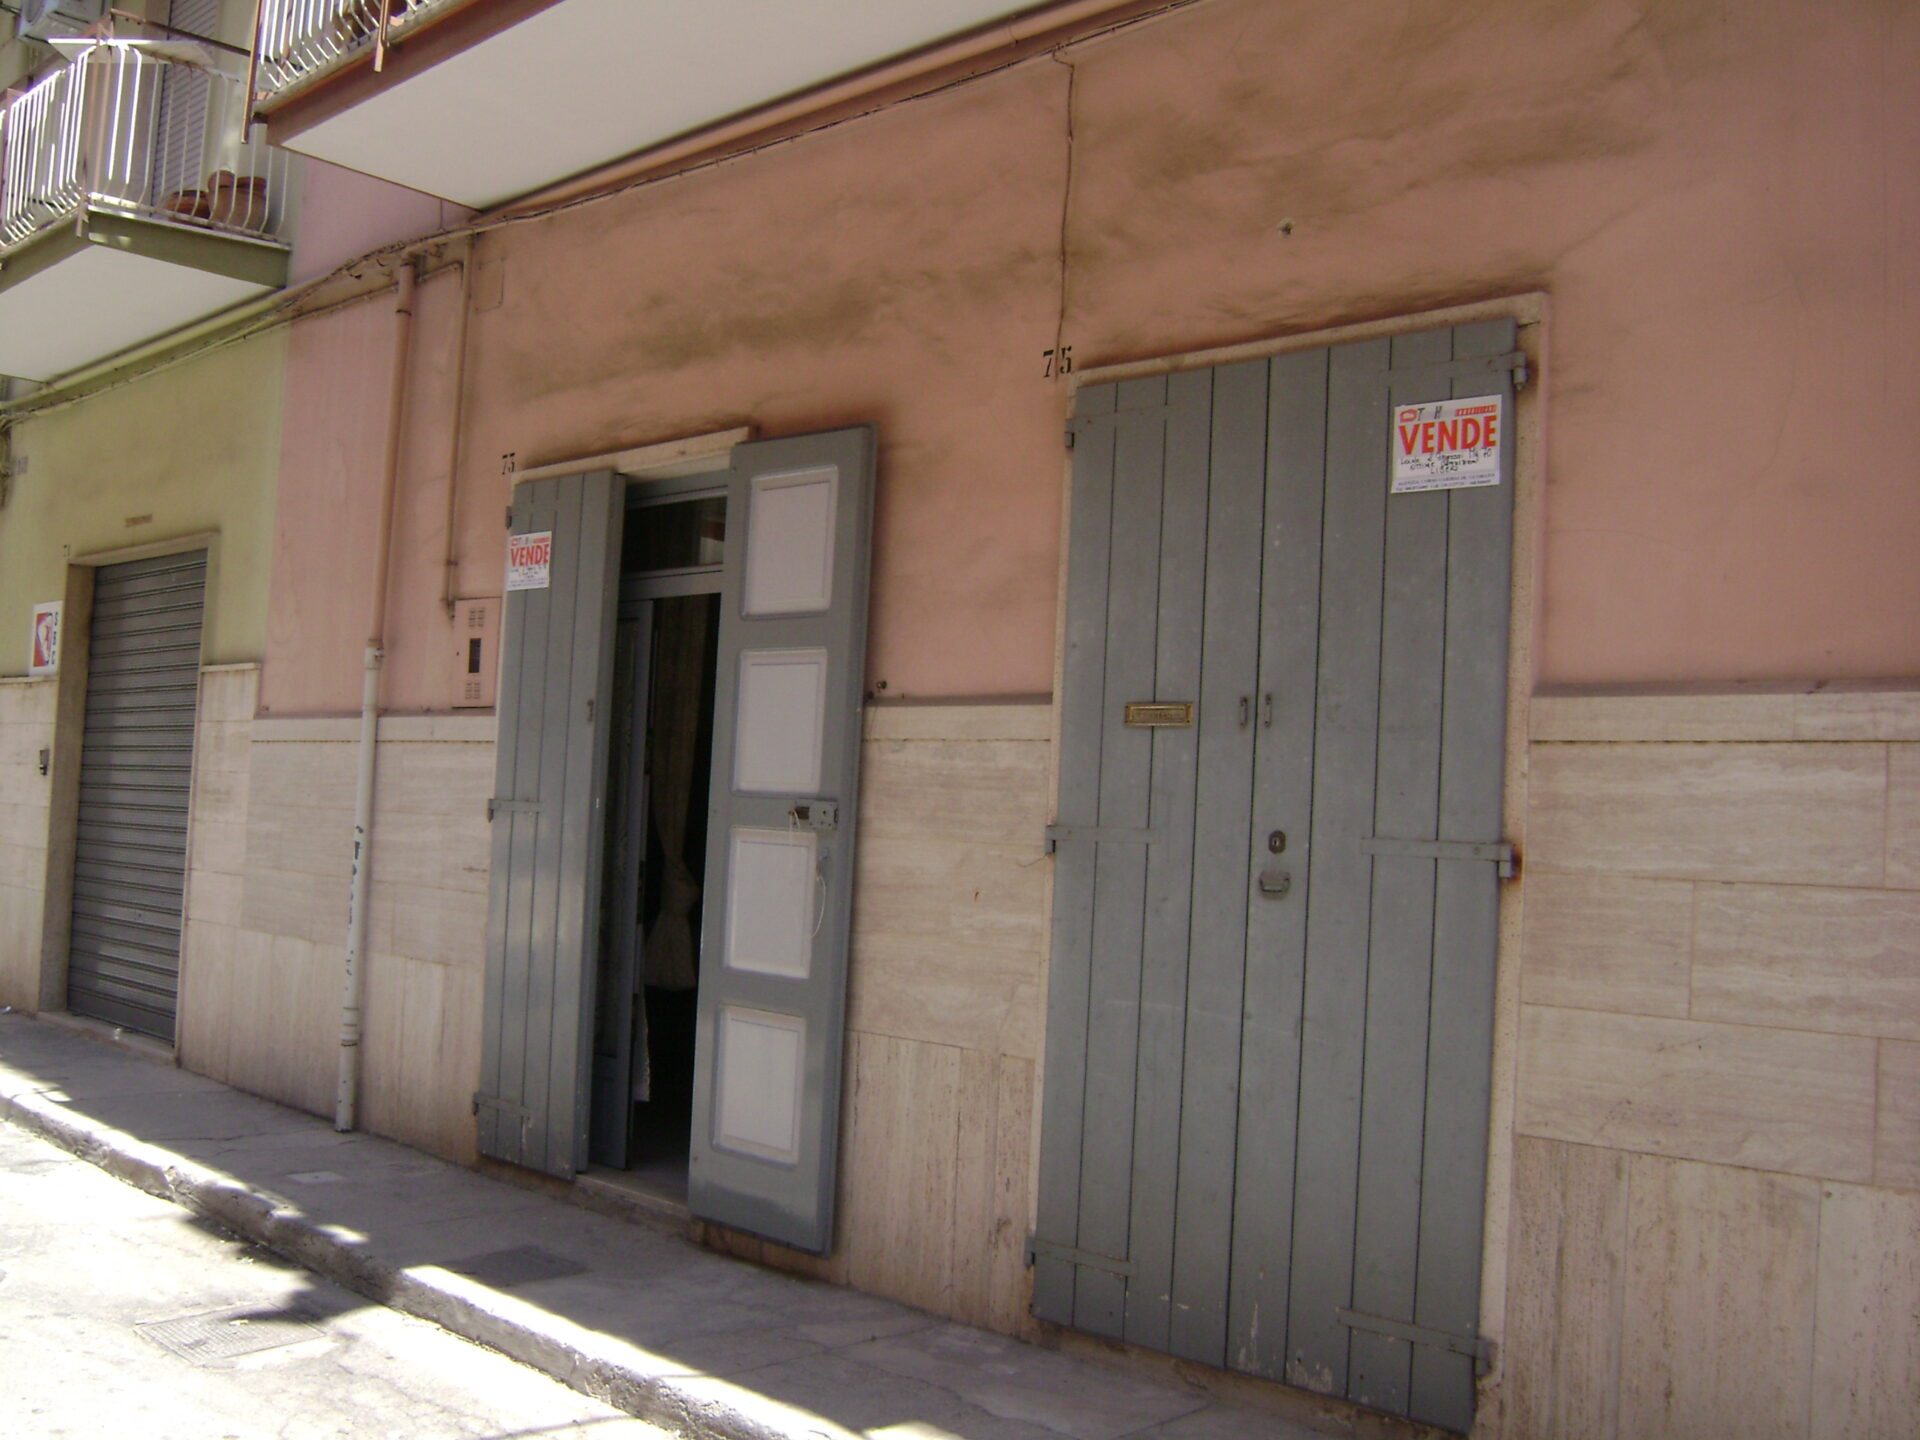 VENDESI LOCALE P.T. 3 VANI – Via C. Cantù